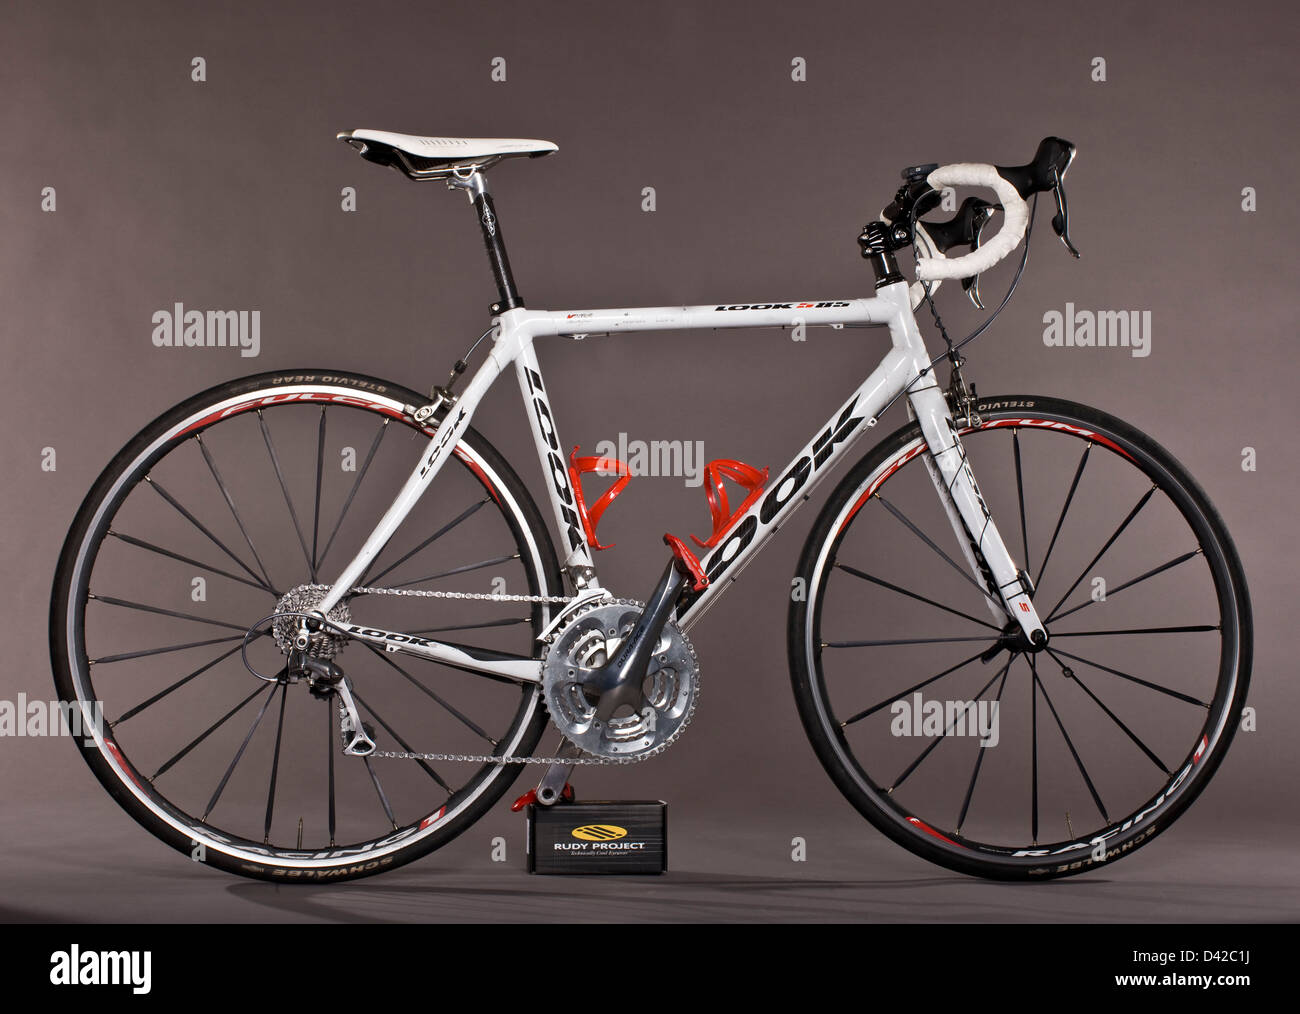 Look 585 custom-Bike mit Carbon-Faser-Rahmen Stockfoto, Bild ...